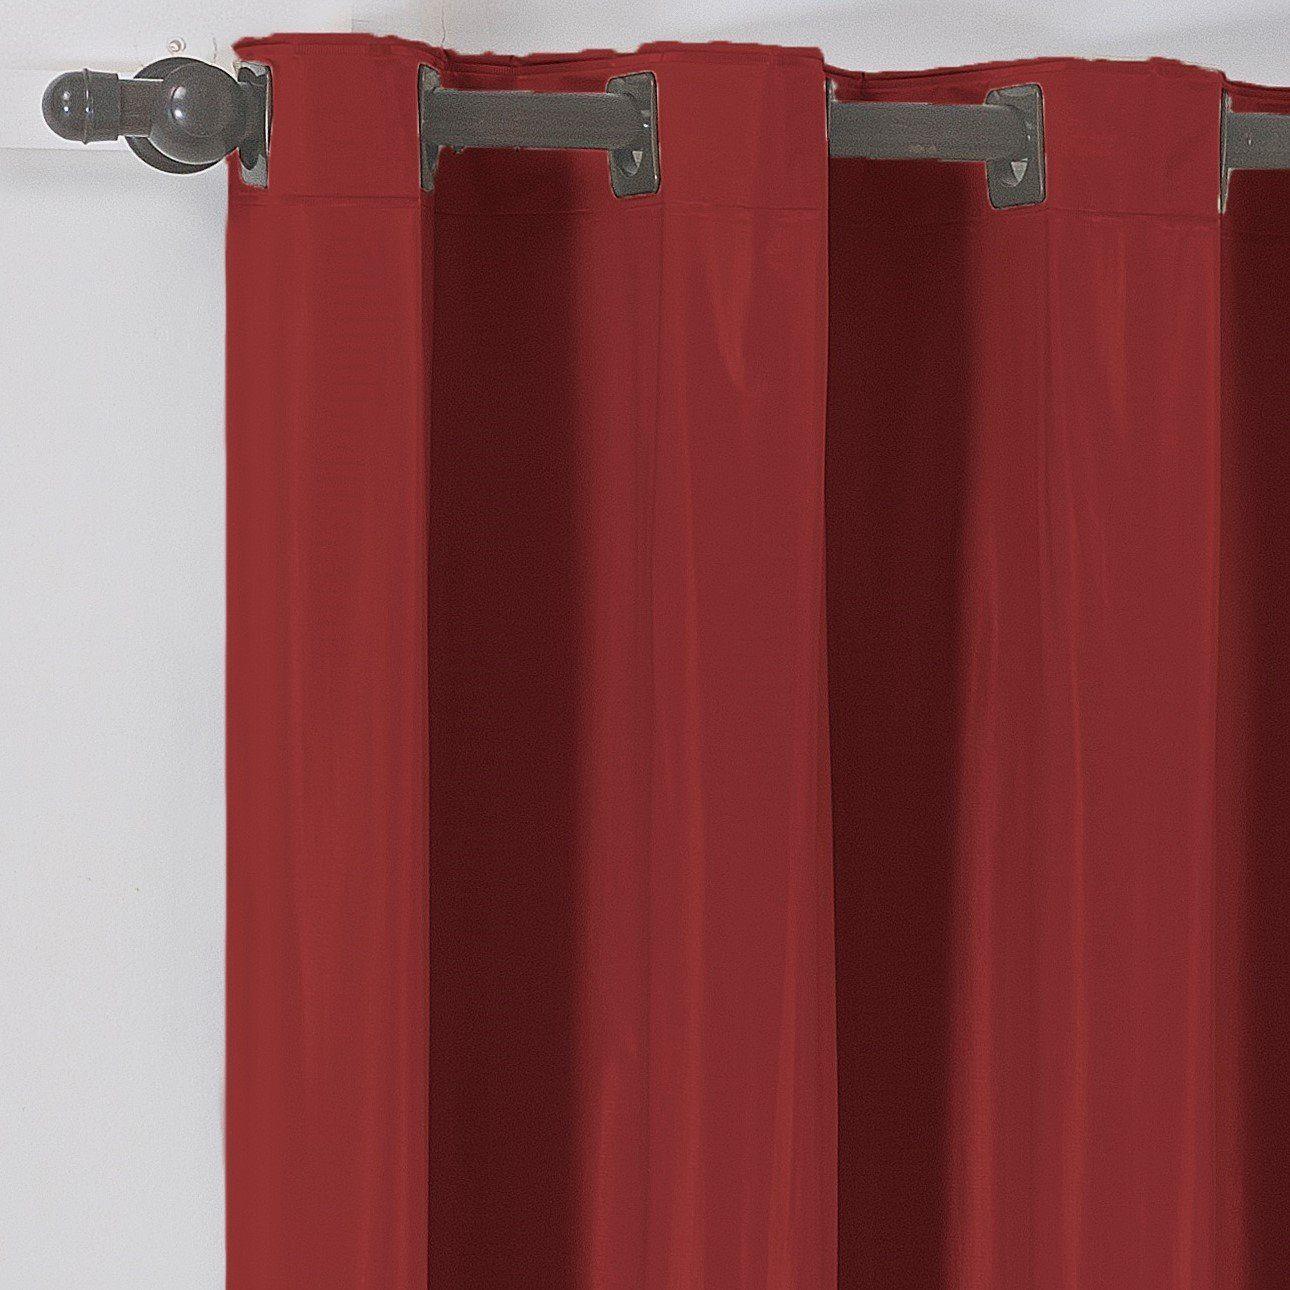 Cortina Blackout Corta Luz PVC (Plástico) Vermelha 2,80 x 1,60 para Varão Simples 2,00 Metros